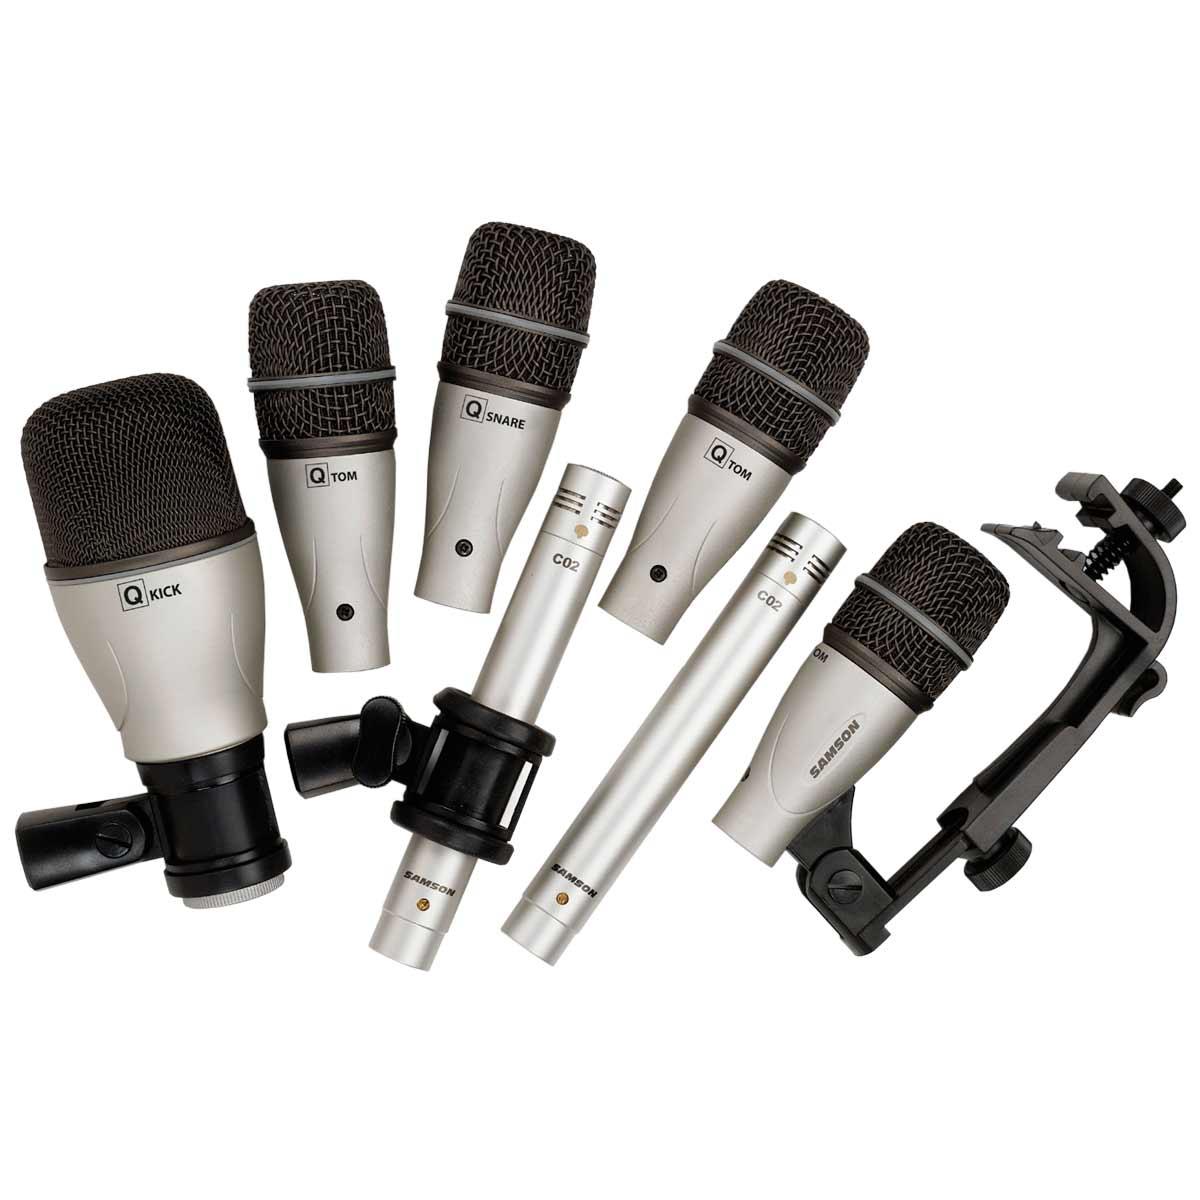 DK7 - Kit 7 Microfones c/ Fio p/ Bateria DK 7 - Samson